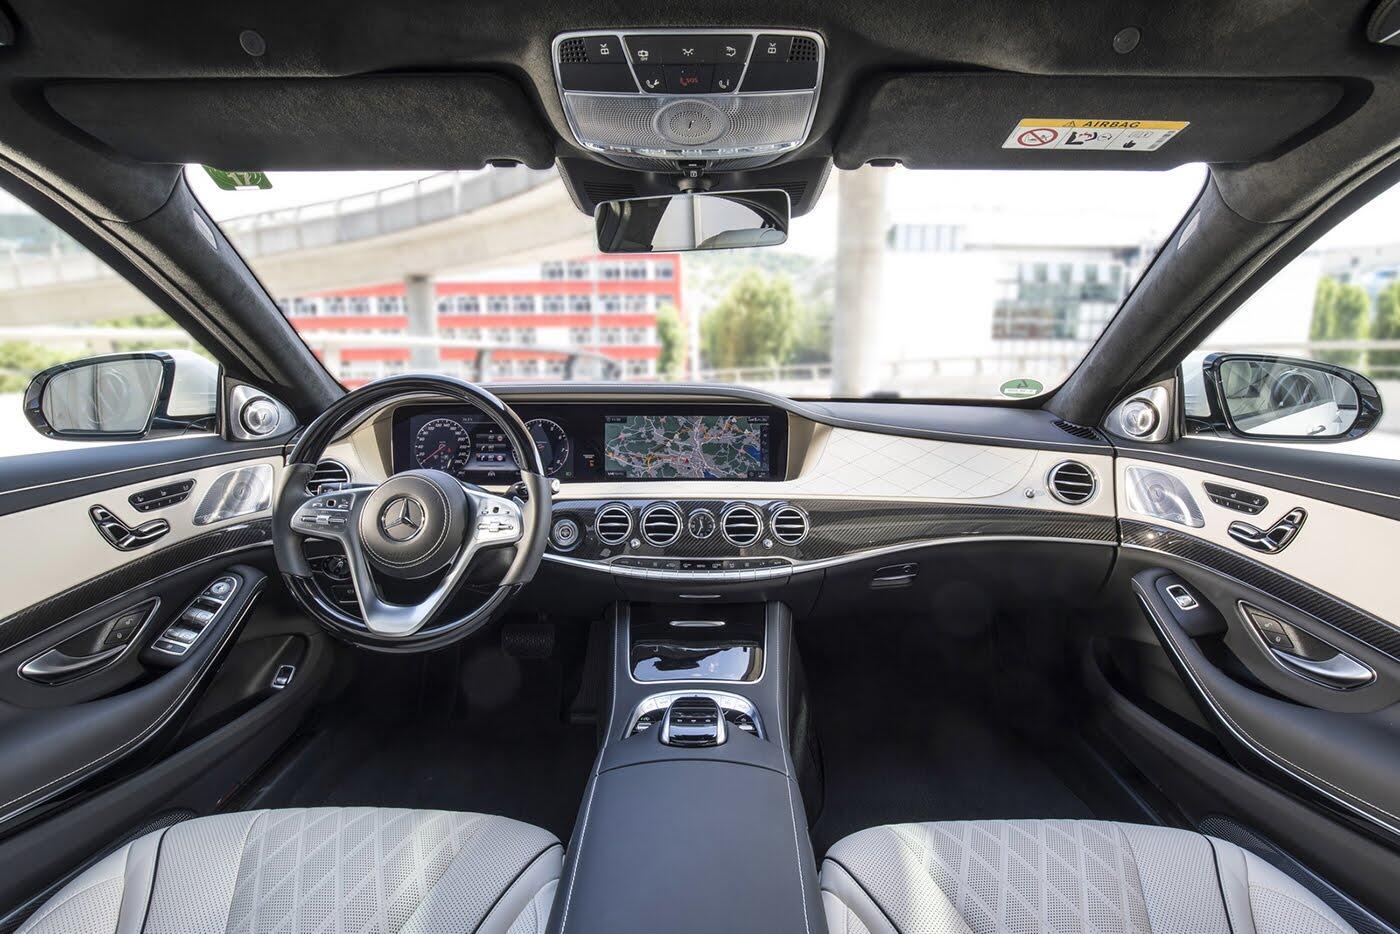 Ảnh chi tiết Mercedes-Benz S-Class 2018 - Hình 40